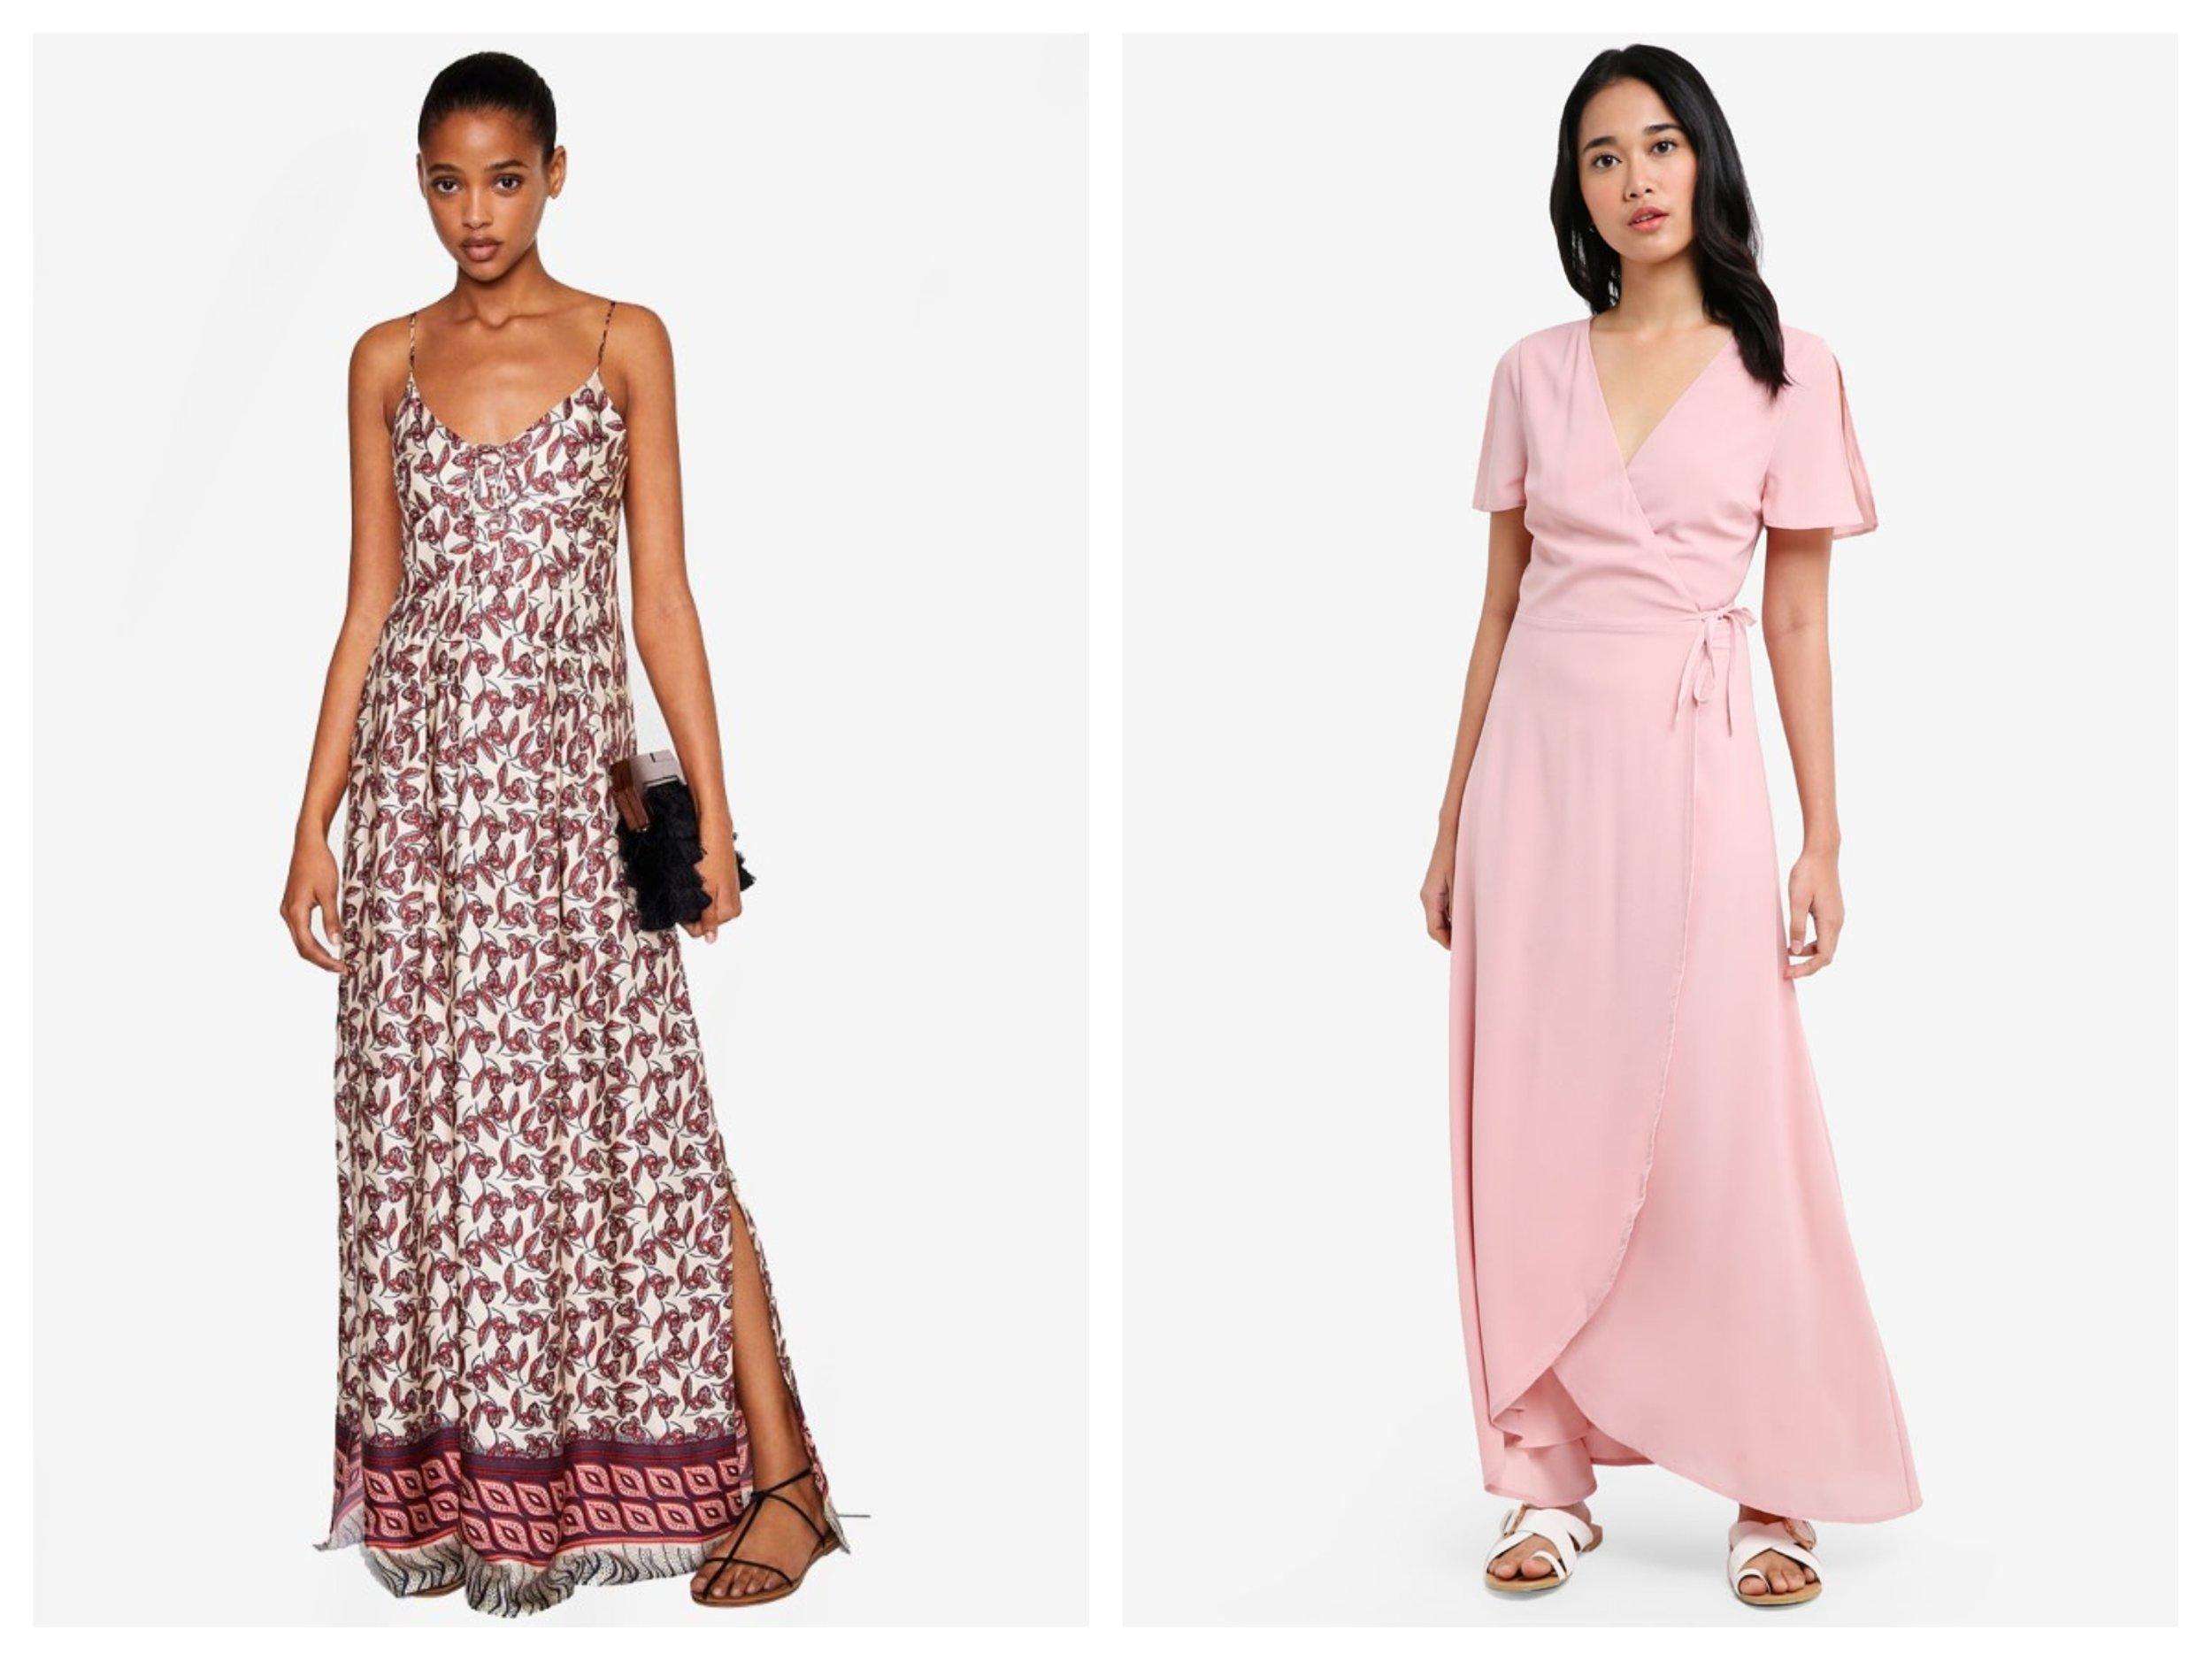 MANGO Contrasting Print Dress  ,  Something Borrowed Slit Sleeve Wrap Maxi Dress